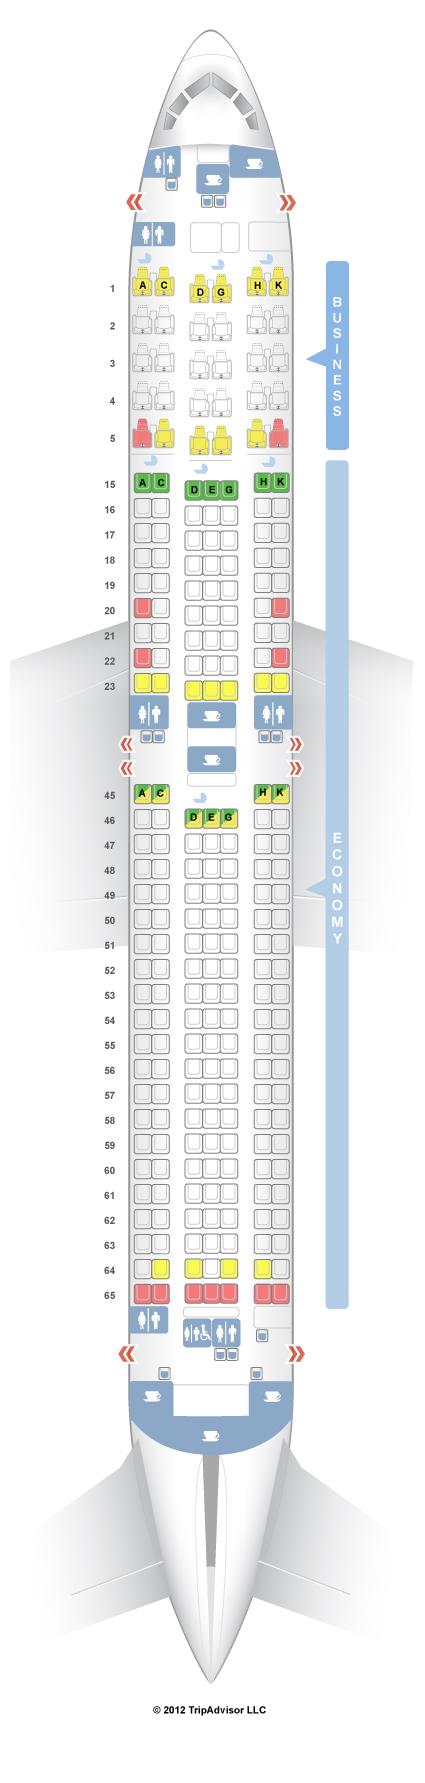 SeatGuru Seat Map Japan Airlines Boeing ER W V - Japan jetstar map